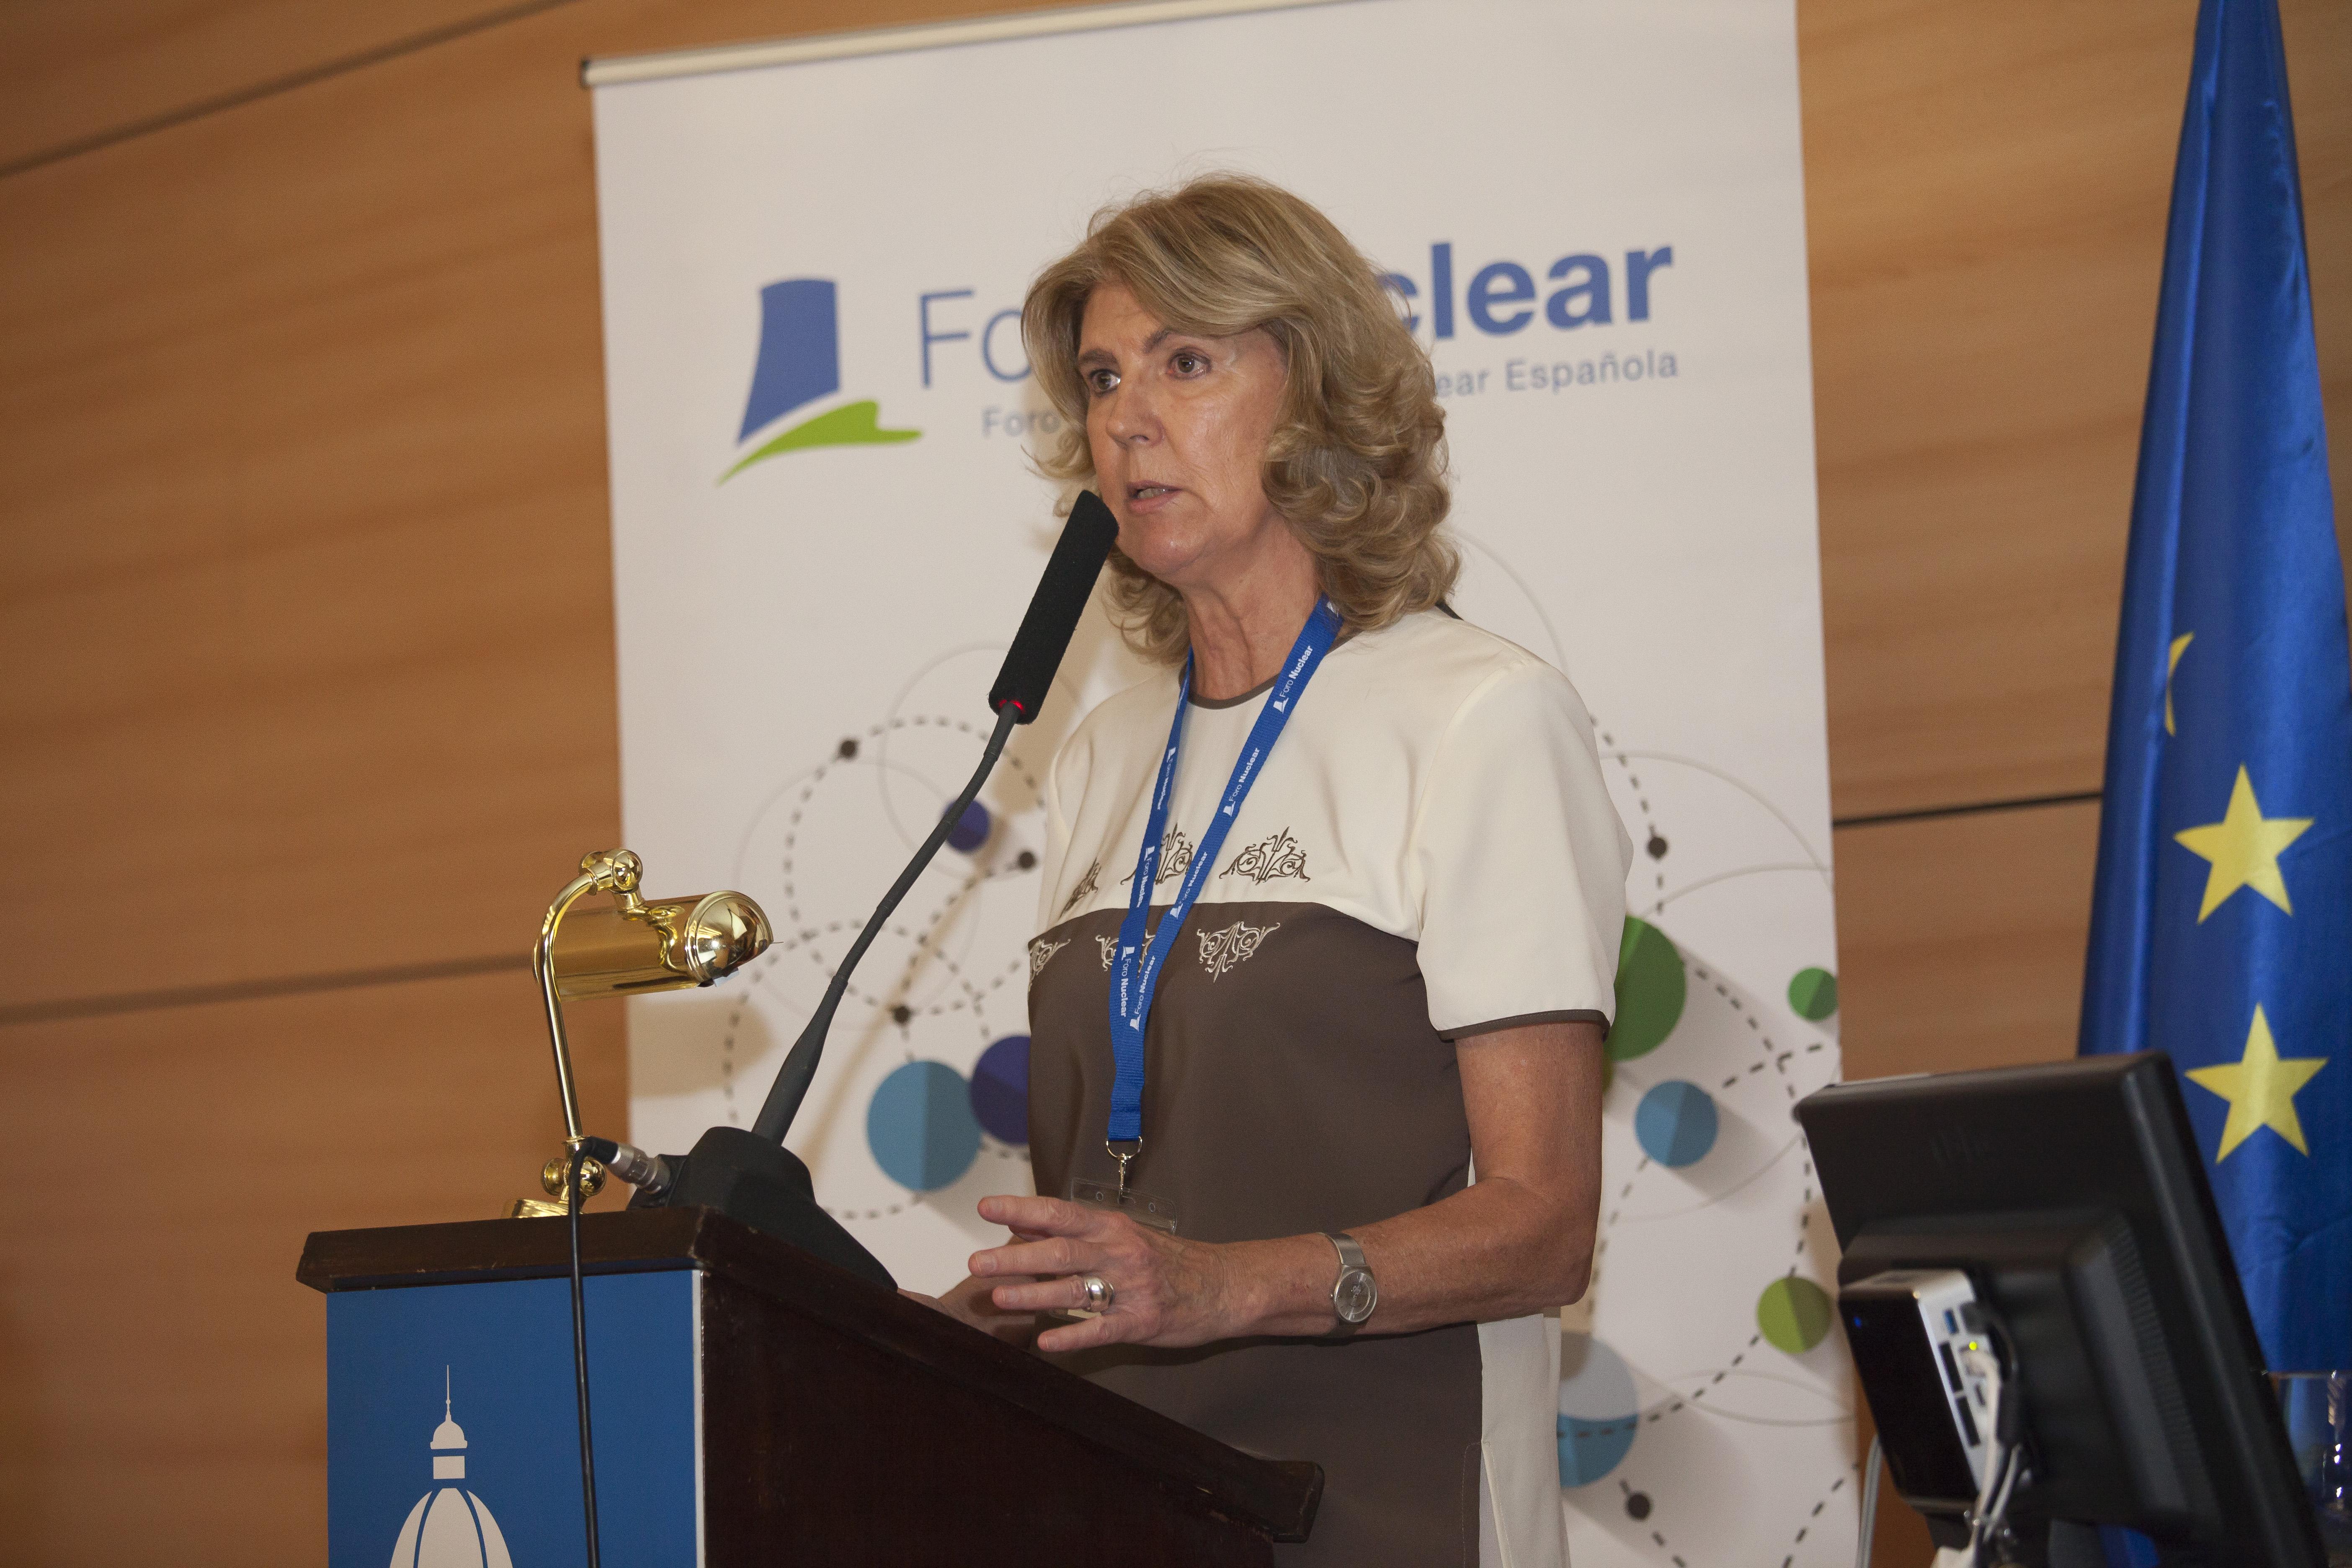 Carolina Ahnert, Catedrática de Ingeniería Nuclear de la Universidad Politécnica de Madrid